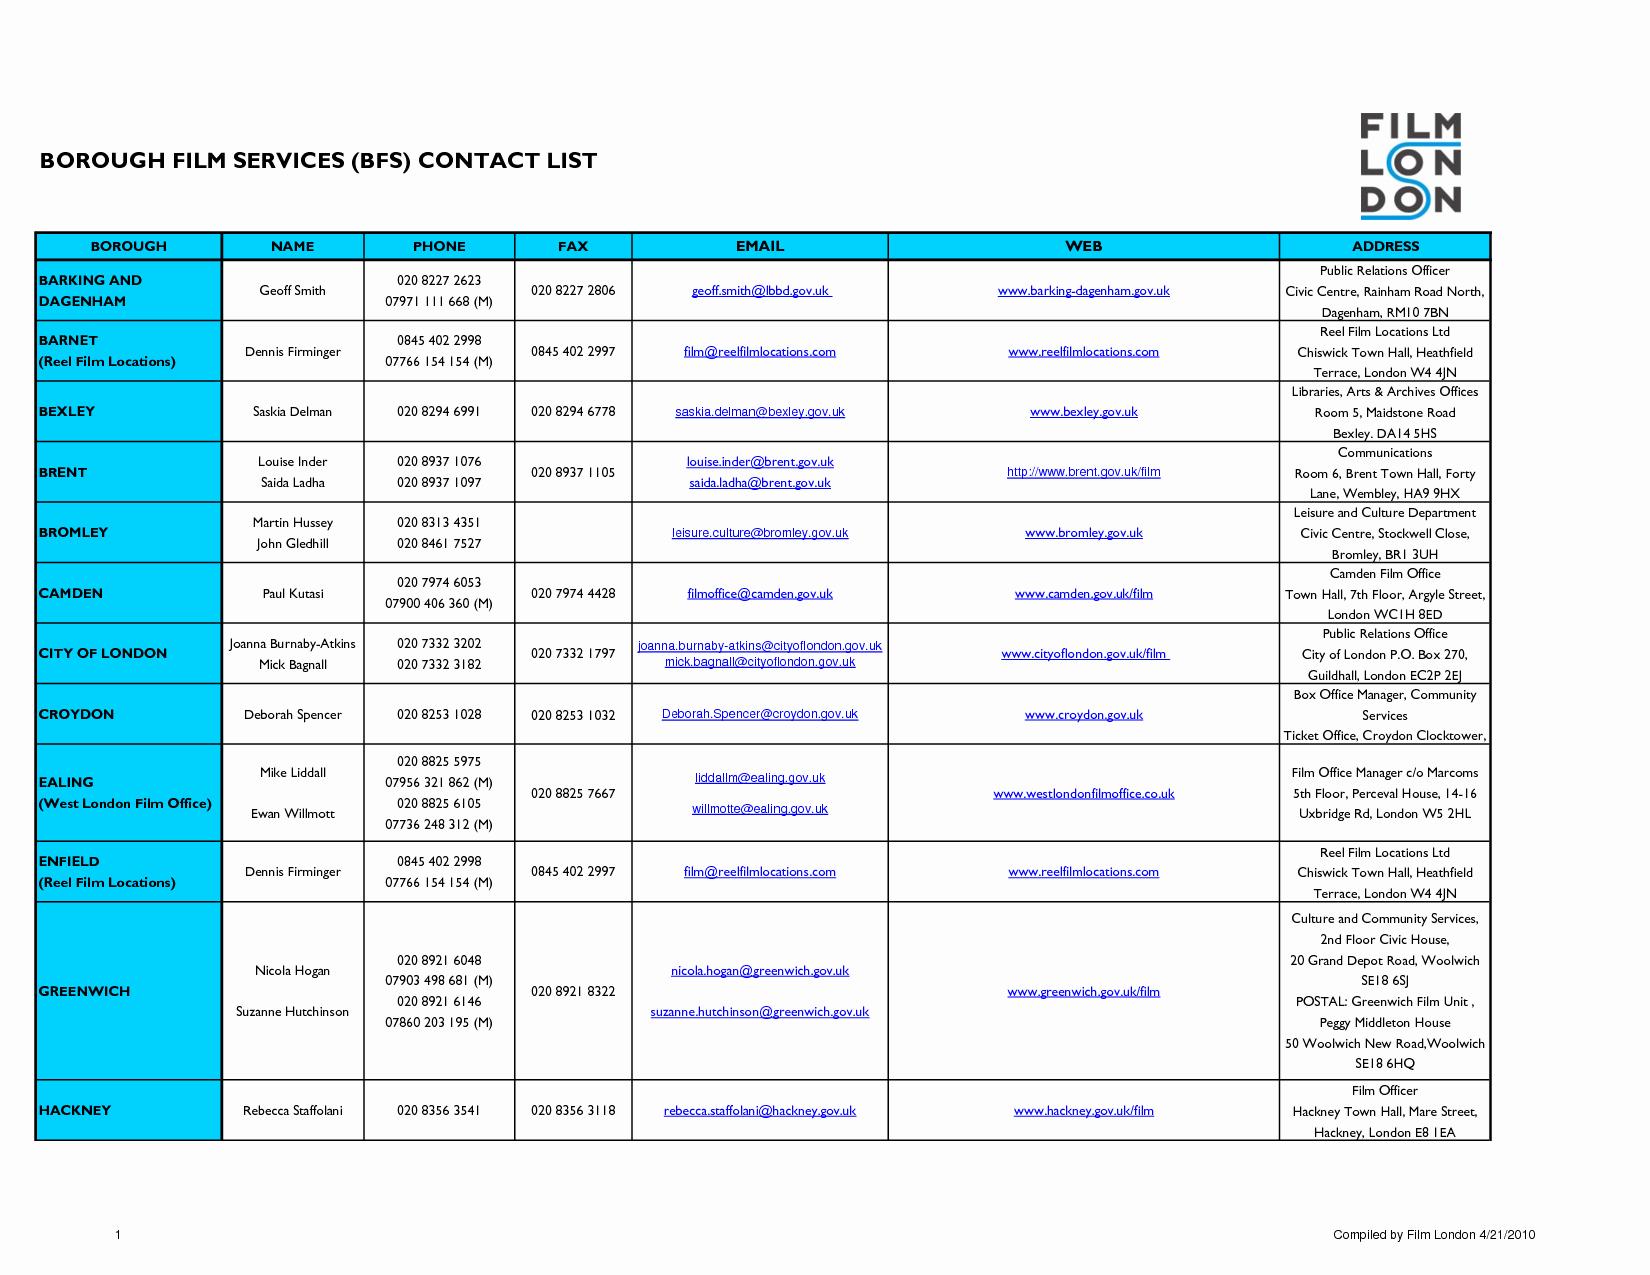 Excel Phone List Template Unique Contact List Excel Template Portablegasgrillweber